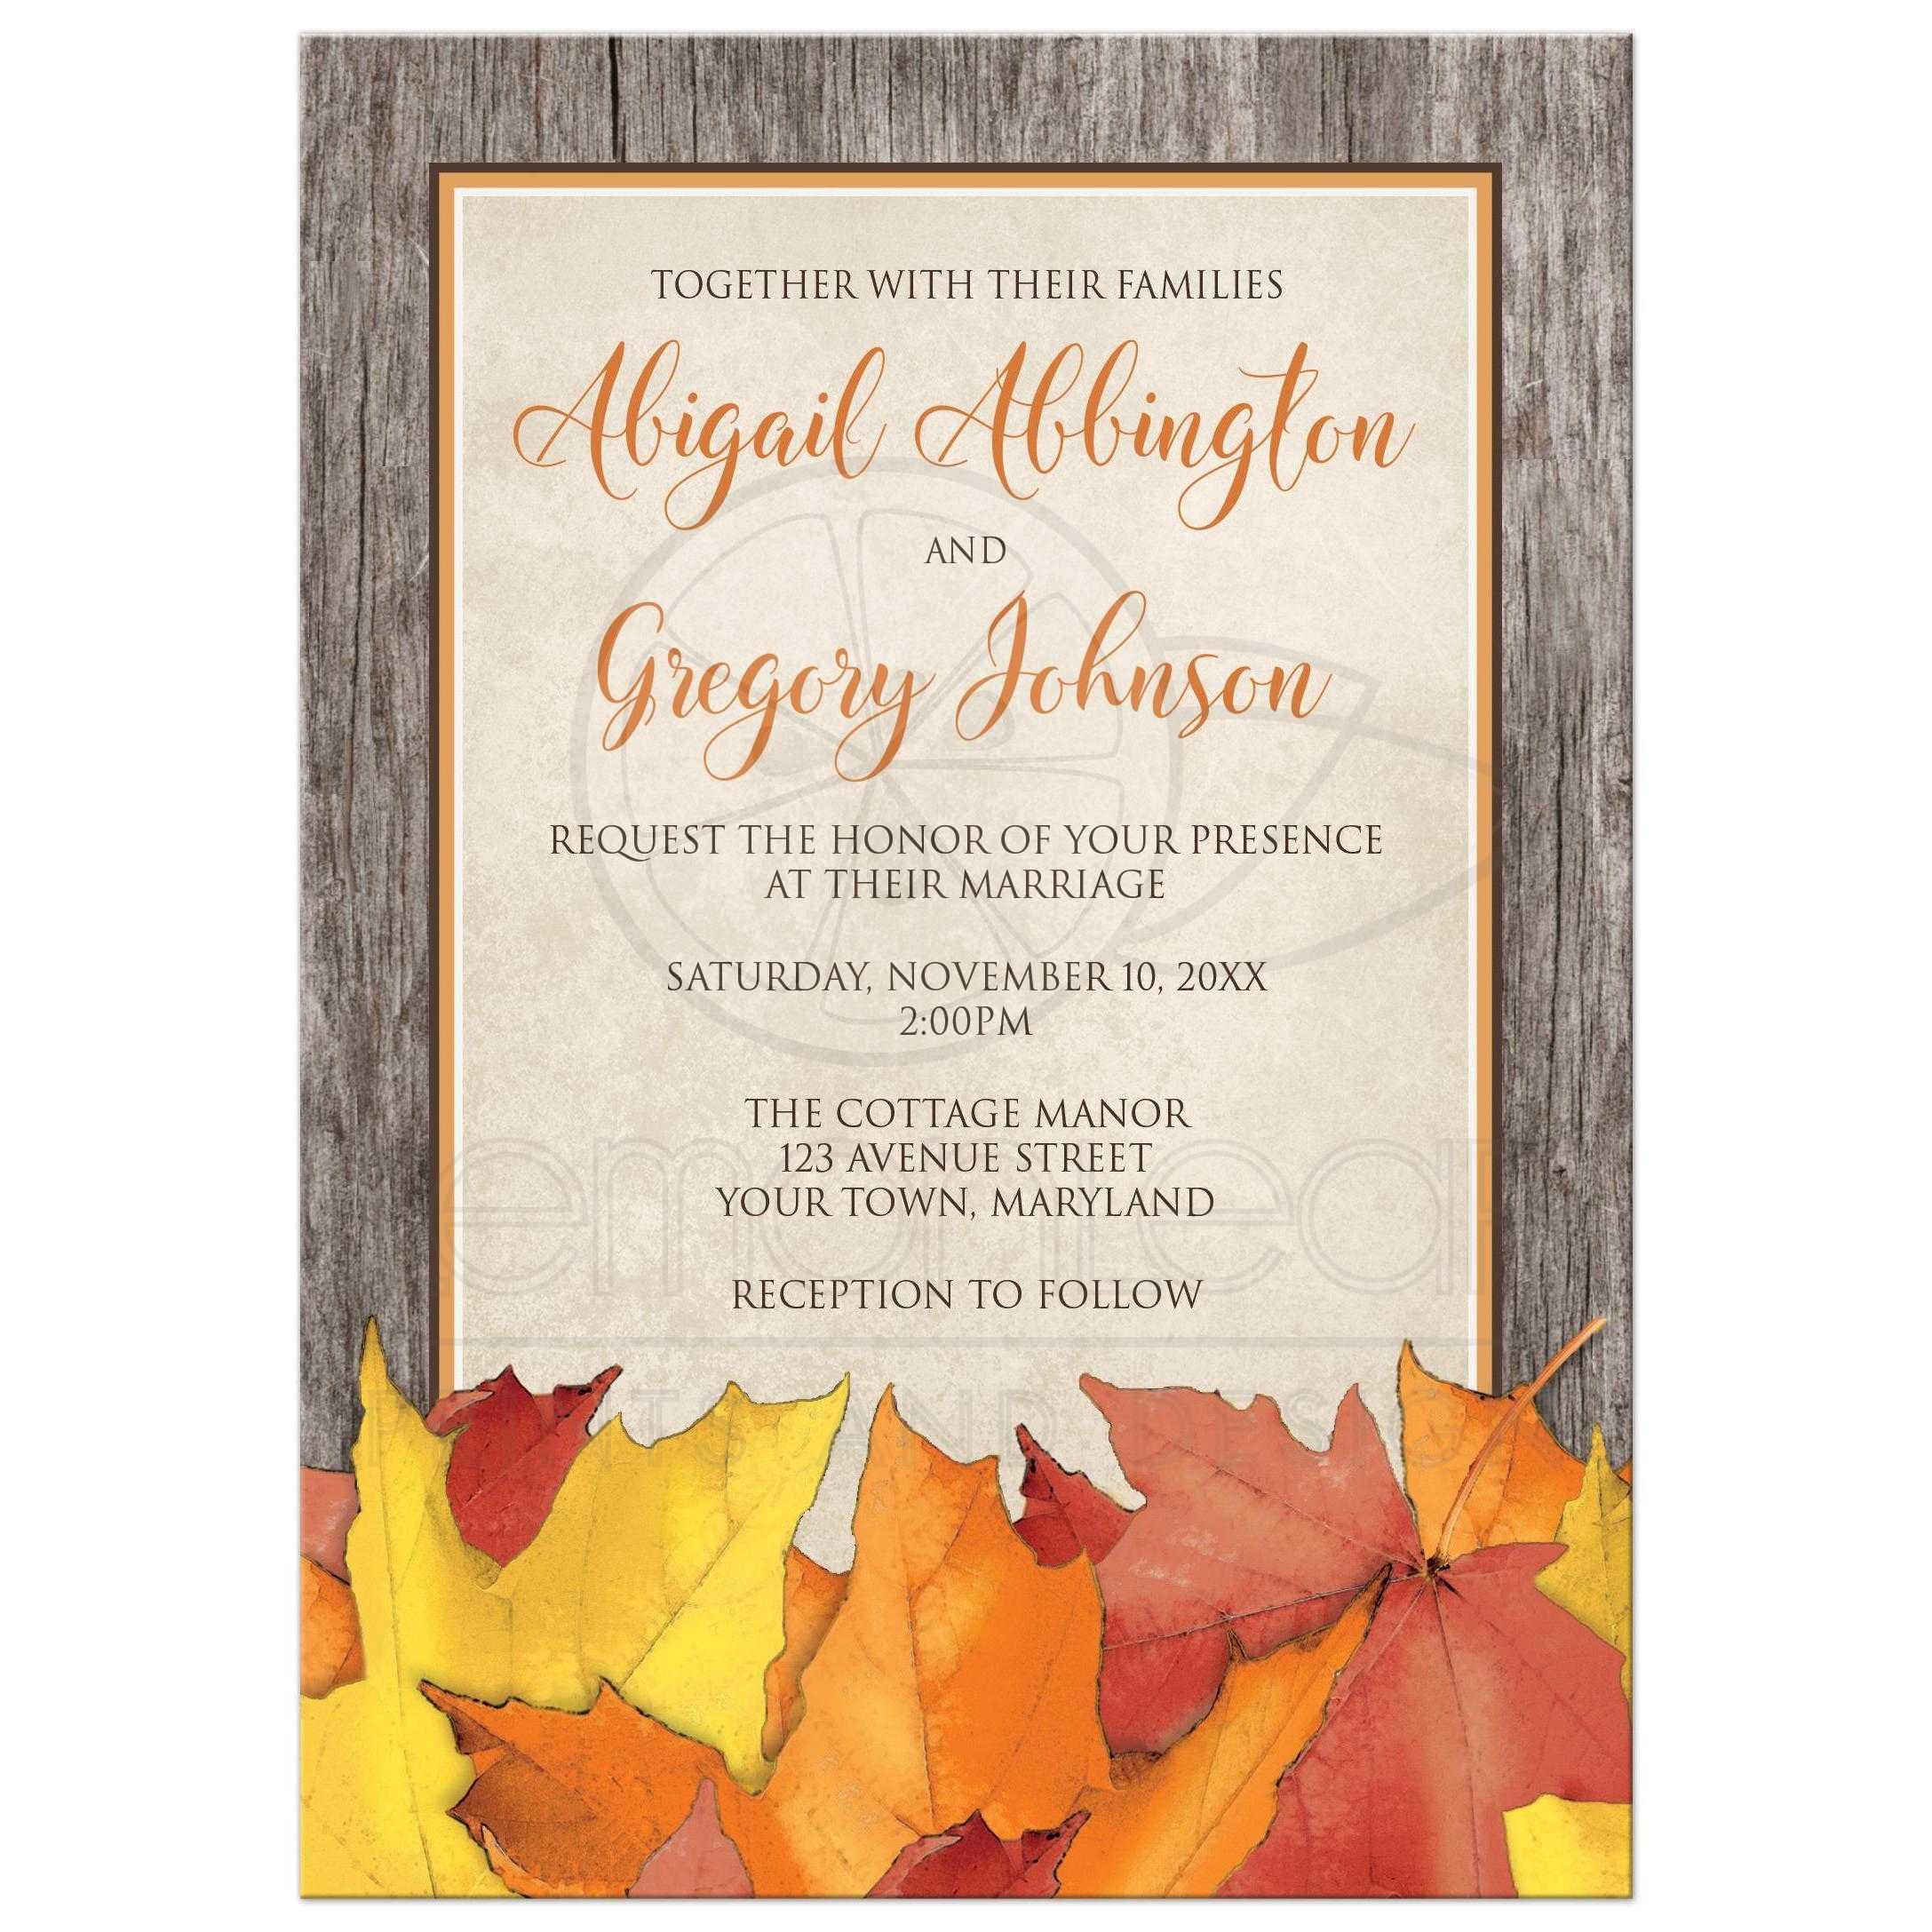 Wedding Invitations   Fall Rustic Wood And Leaves